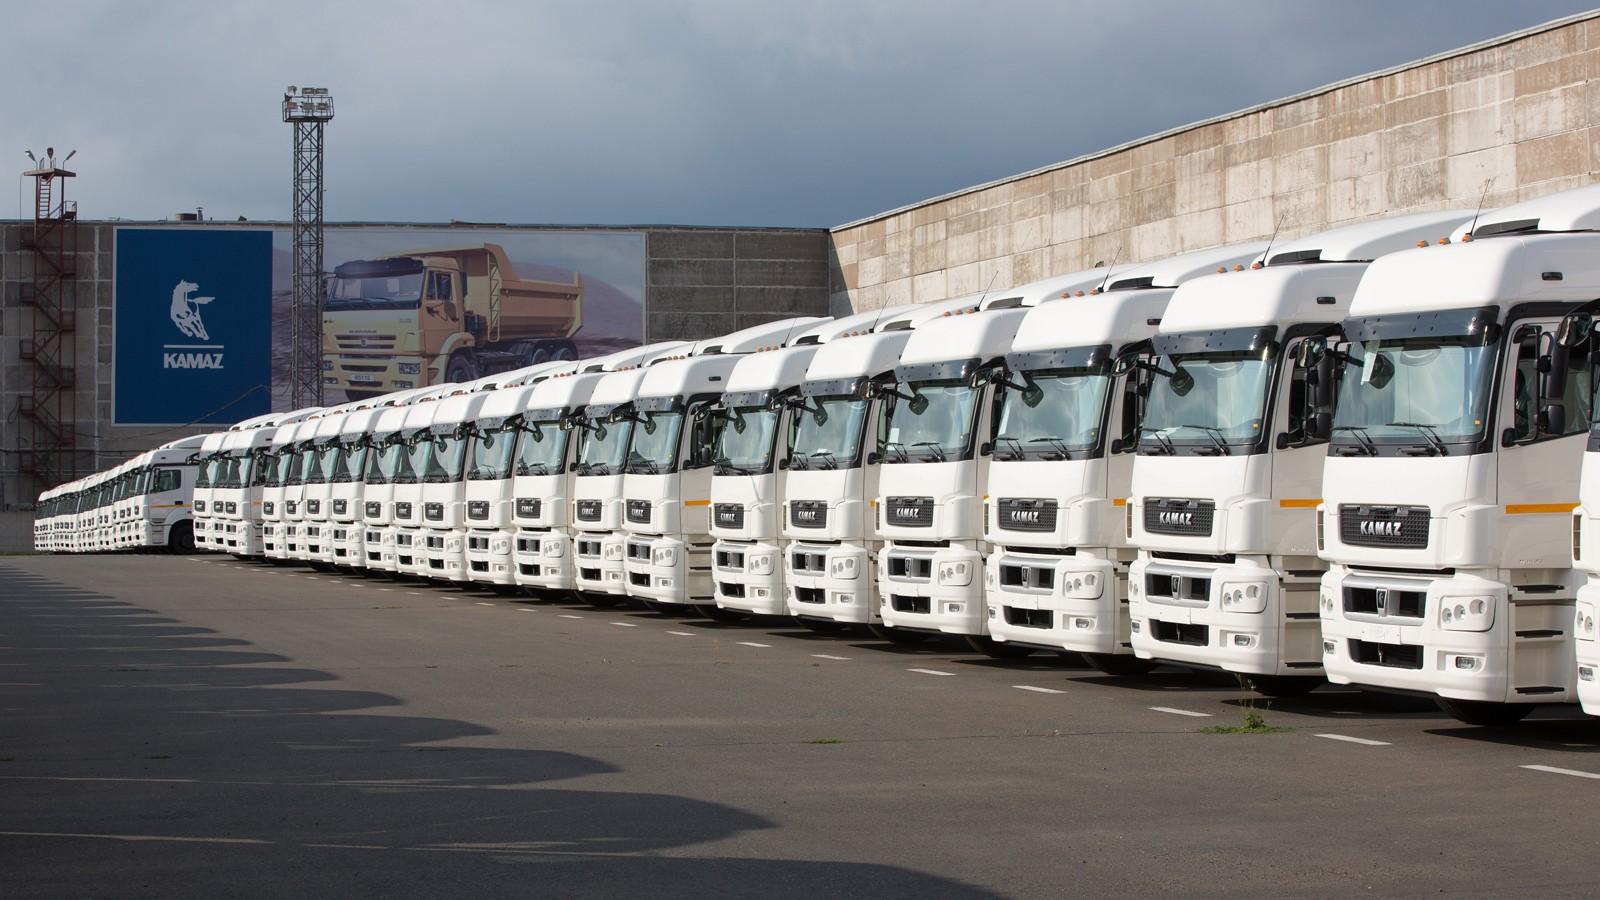 The OAO Kamaz automobile plant, Naberezhnye Chelny, Russia, August 11, 2014.